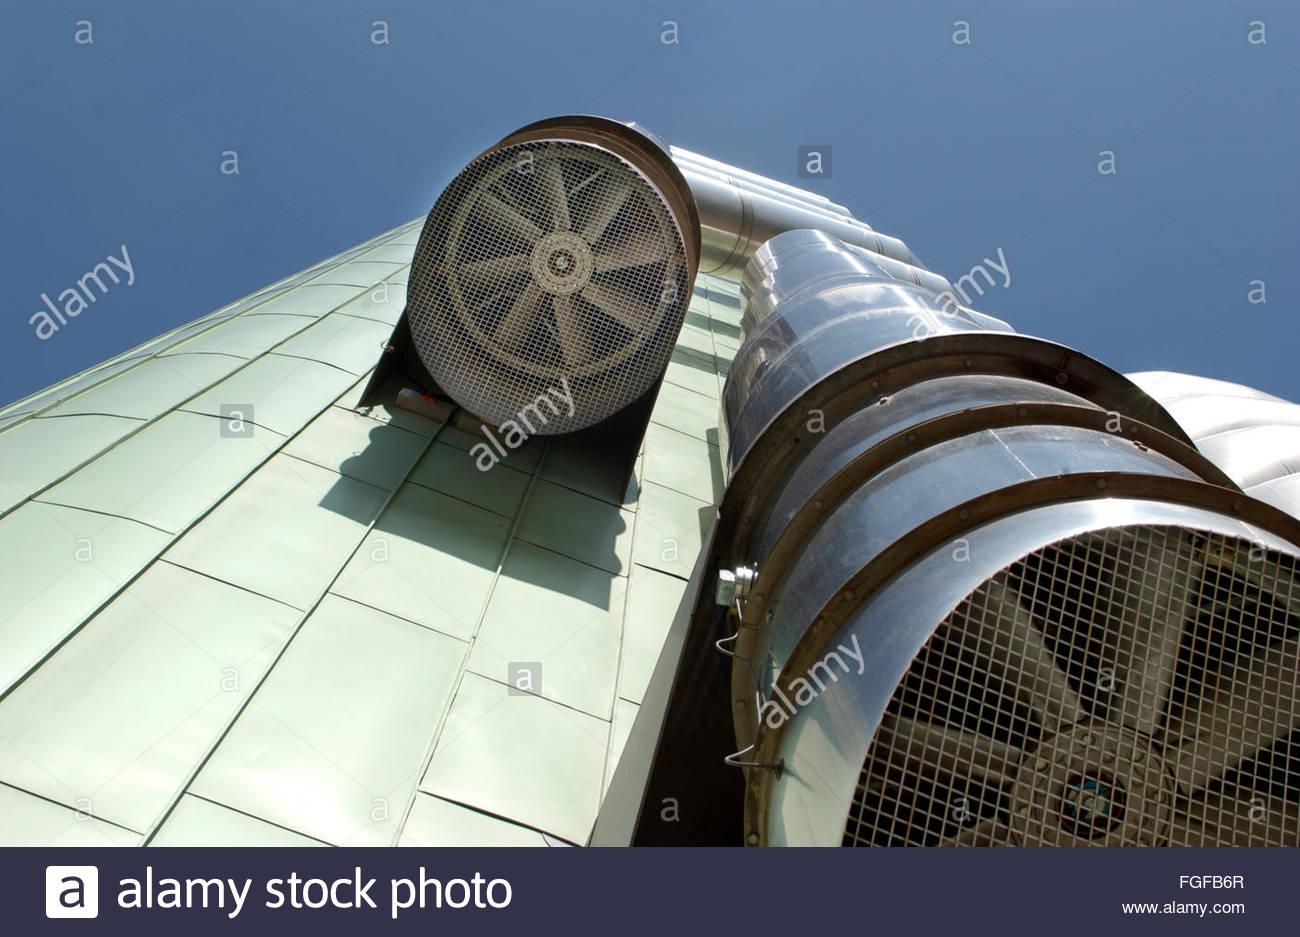 Ventilation Fans Stockfotos & Ventilation Fans Bilder - Alamy